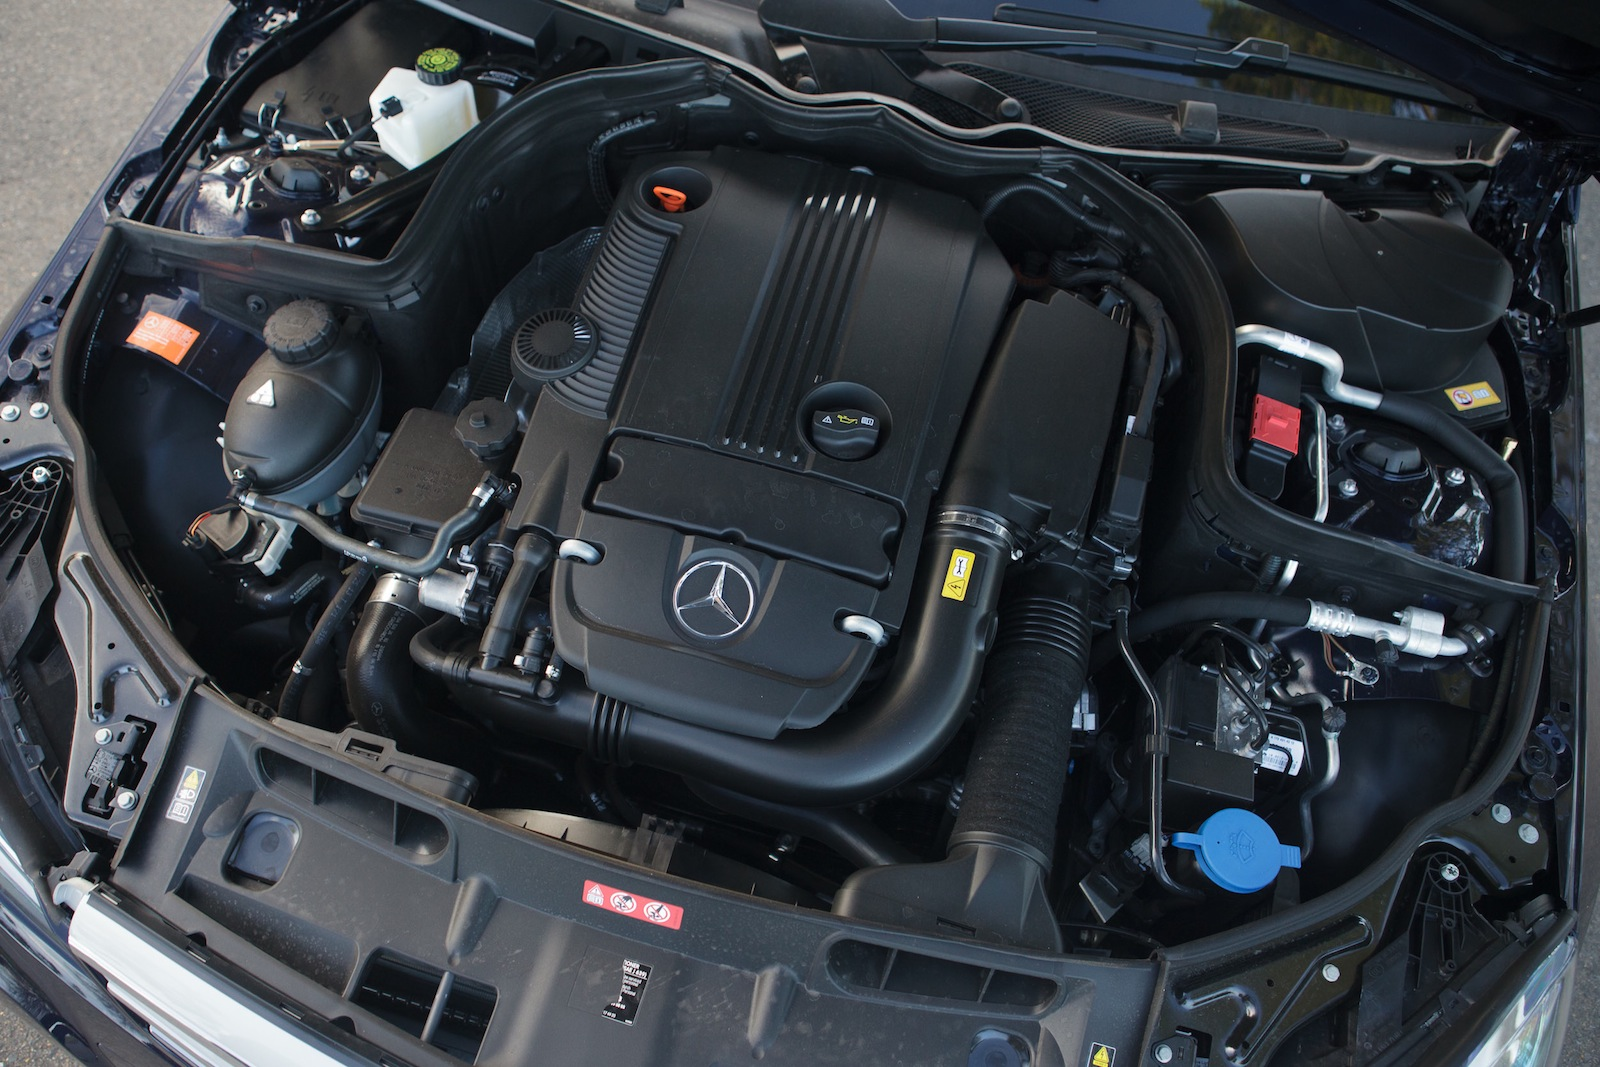 Compact luxury comparison: Lexus IS v BMW 3 Series v Audi A4 v